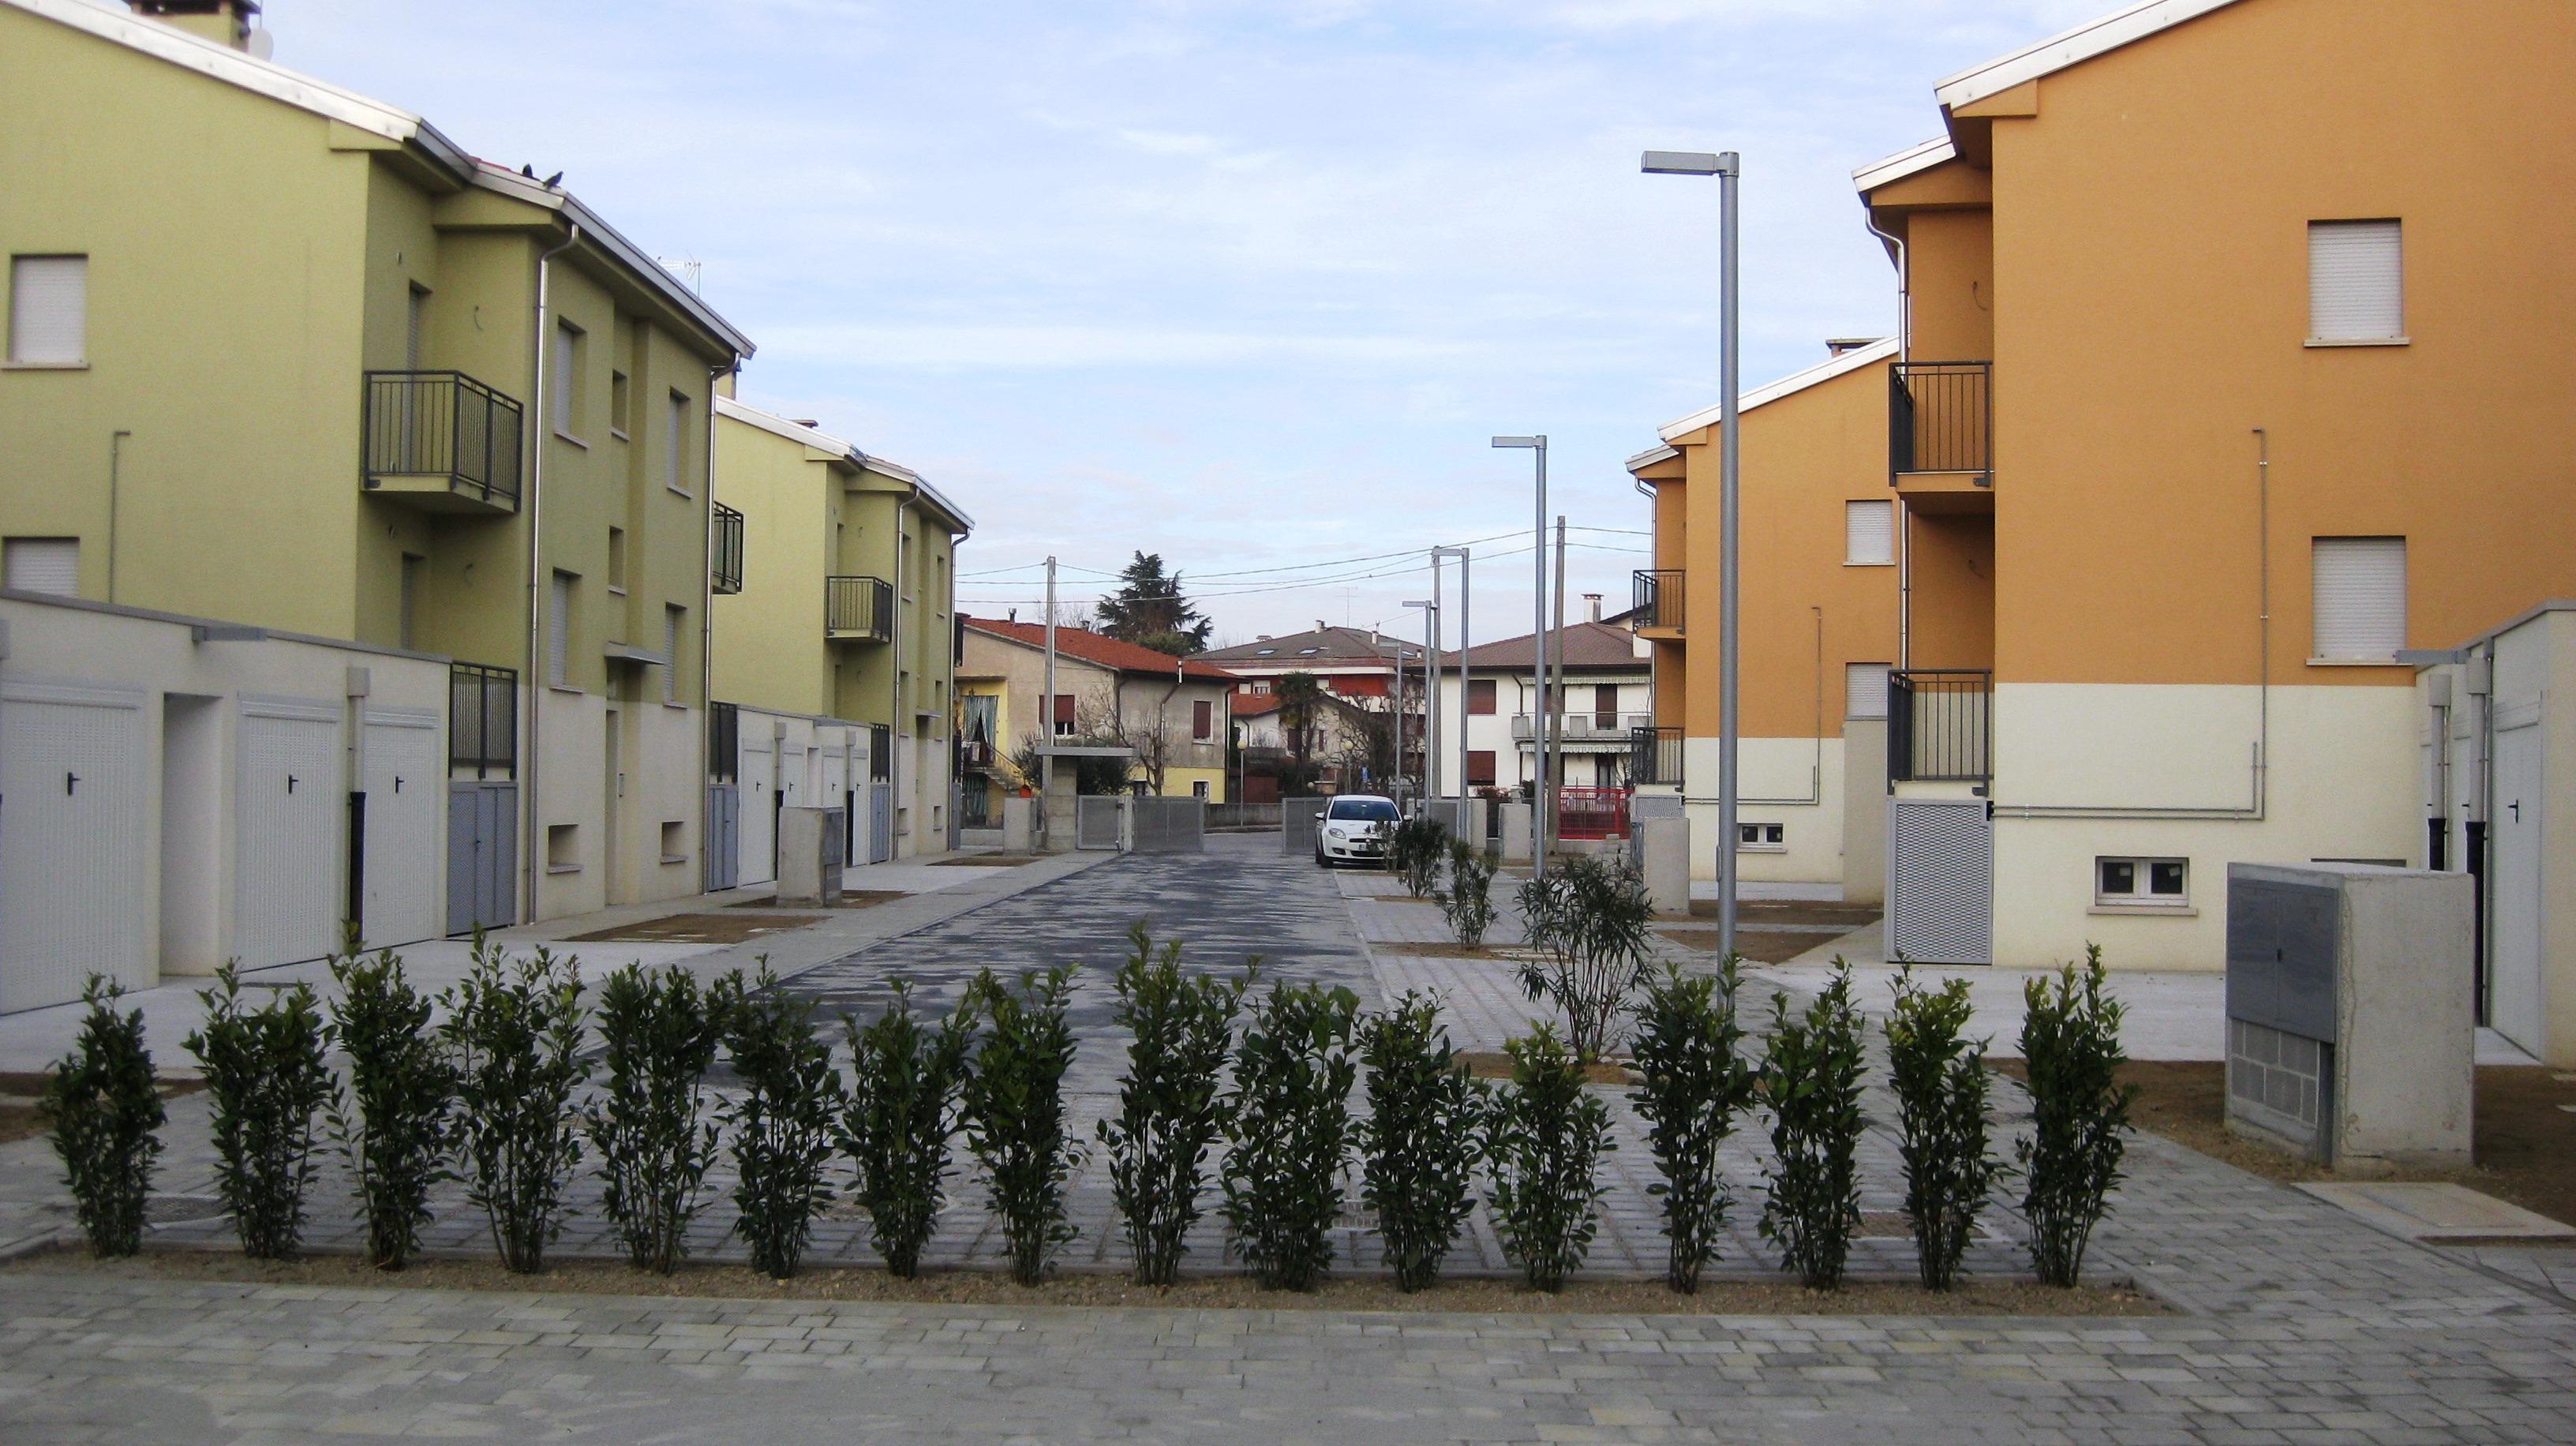 Azienda Territoriale Per L Edilizia Residenziale L Ater Assegna Nove Alloggi Erp Green A Fossalta Di Piave